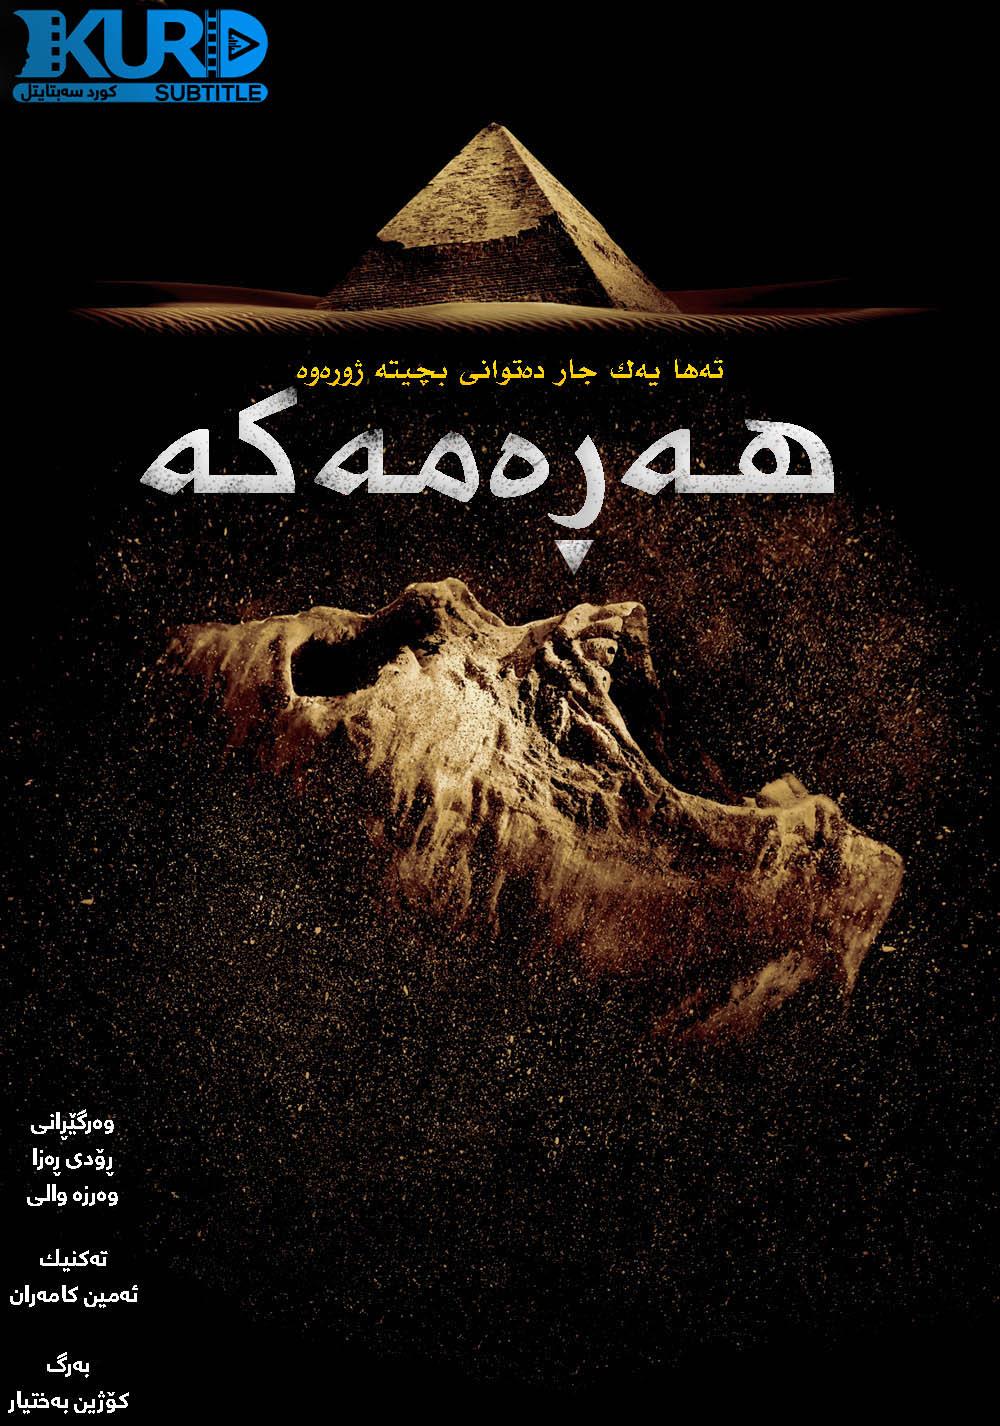 The Pyramid kurdish poster